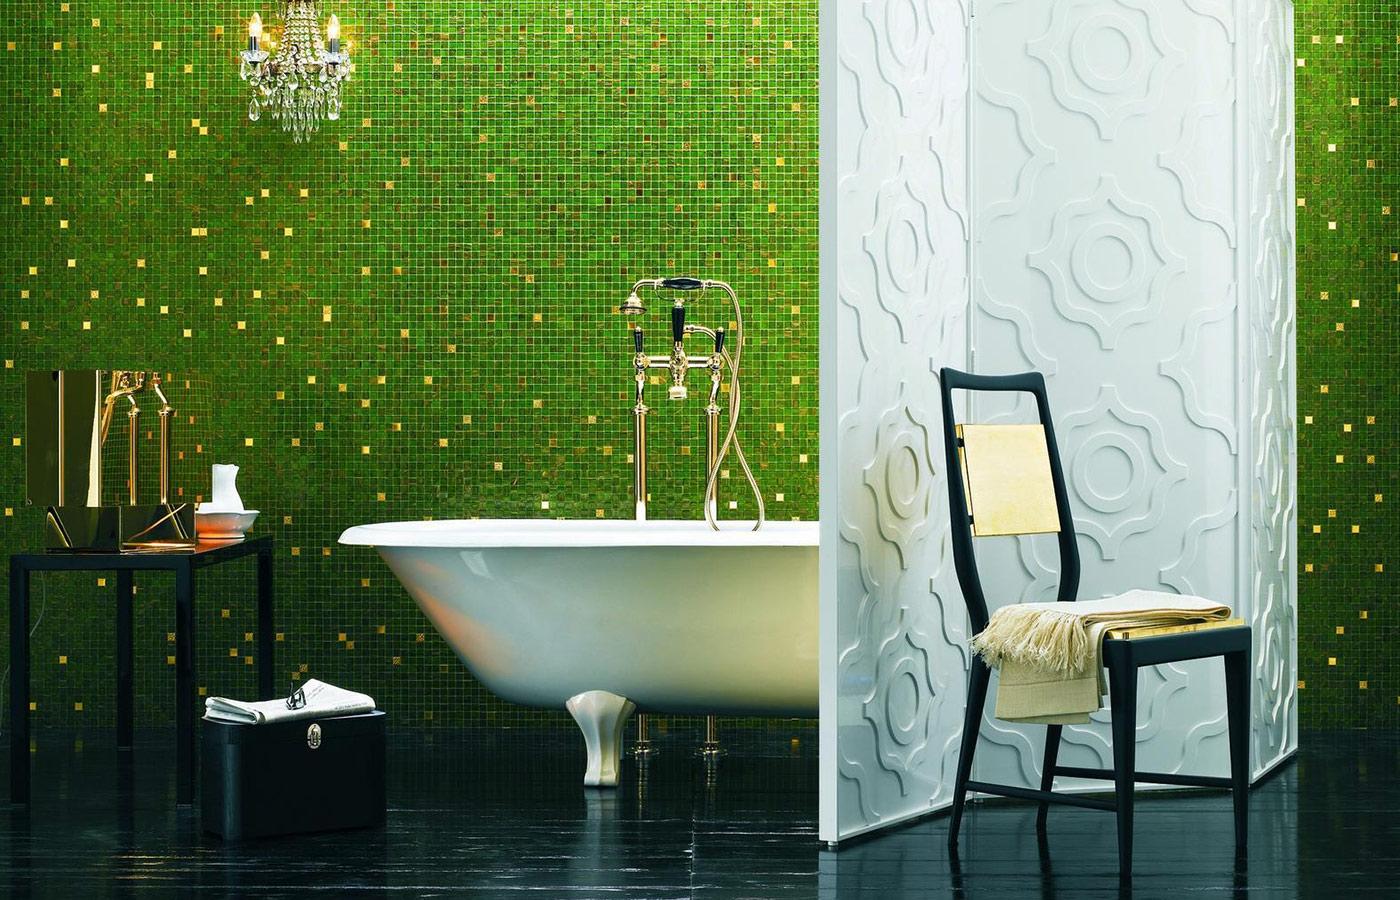 About Us Westone Ghana - Green-bathroom-tile